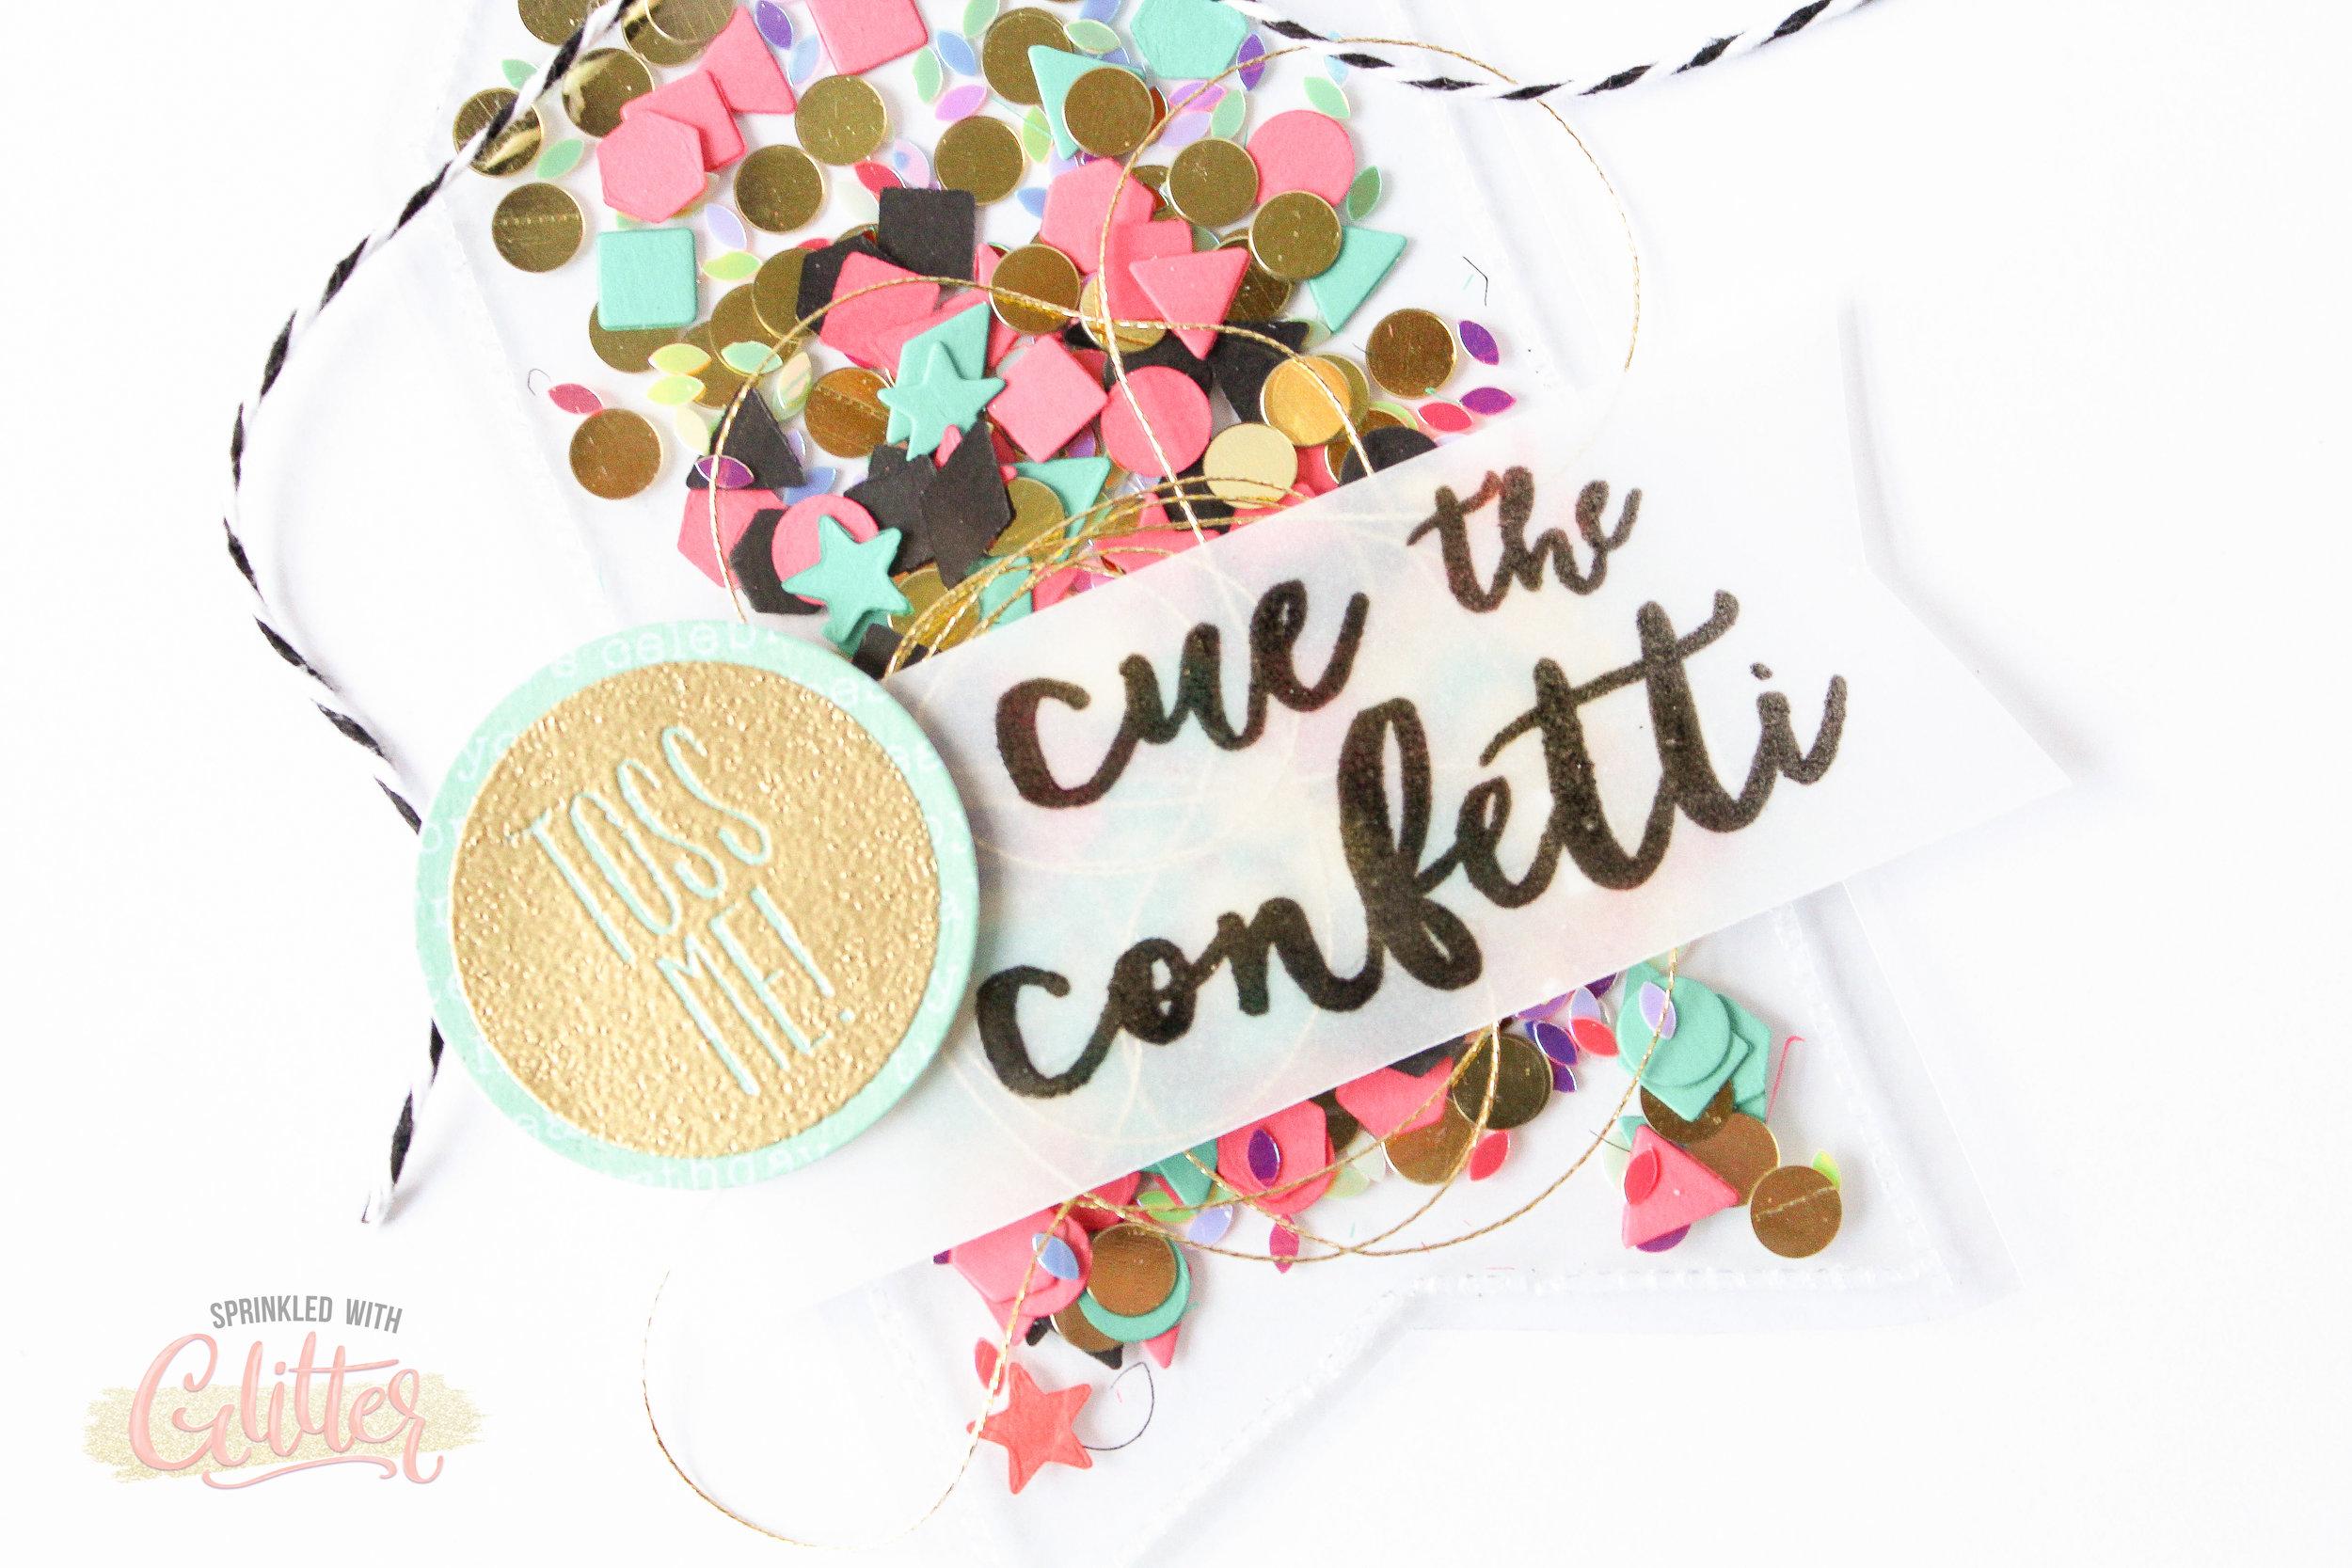 Confetti shaker tags watermark-11.jpg